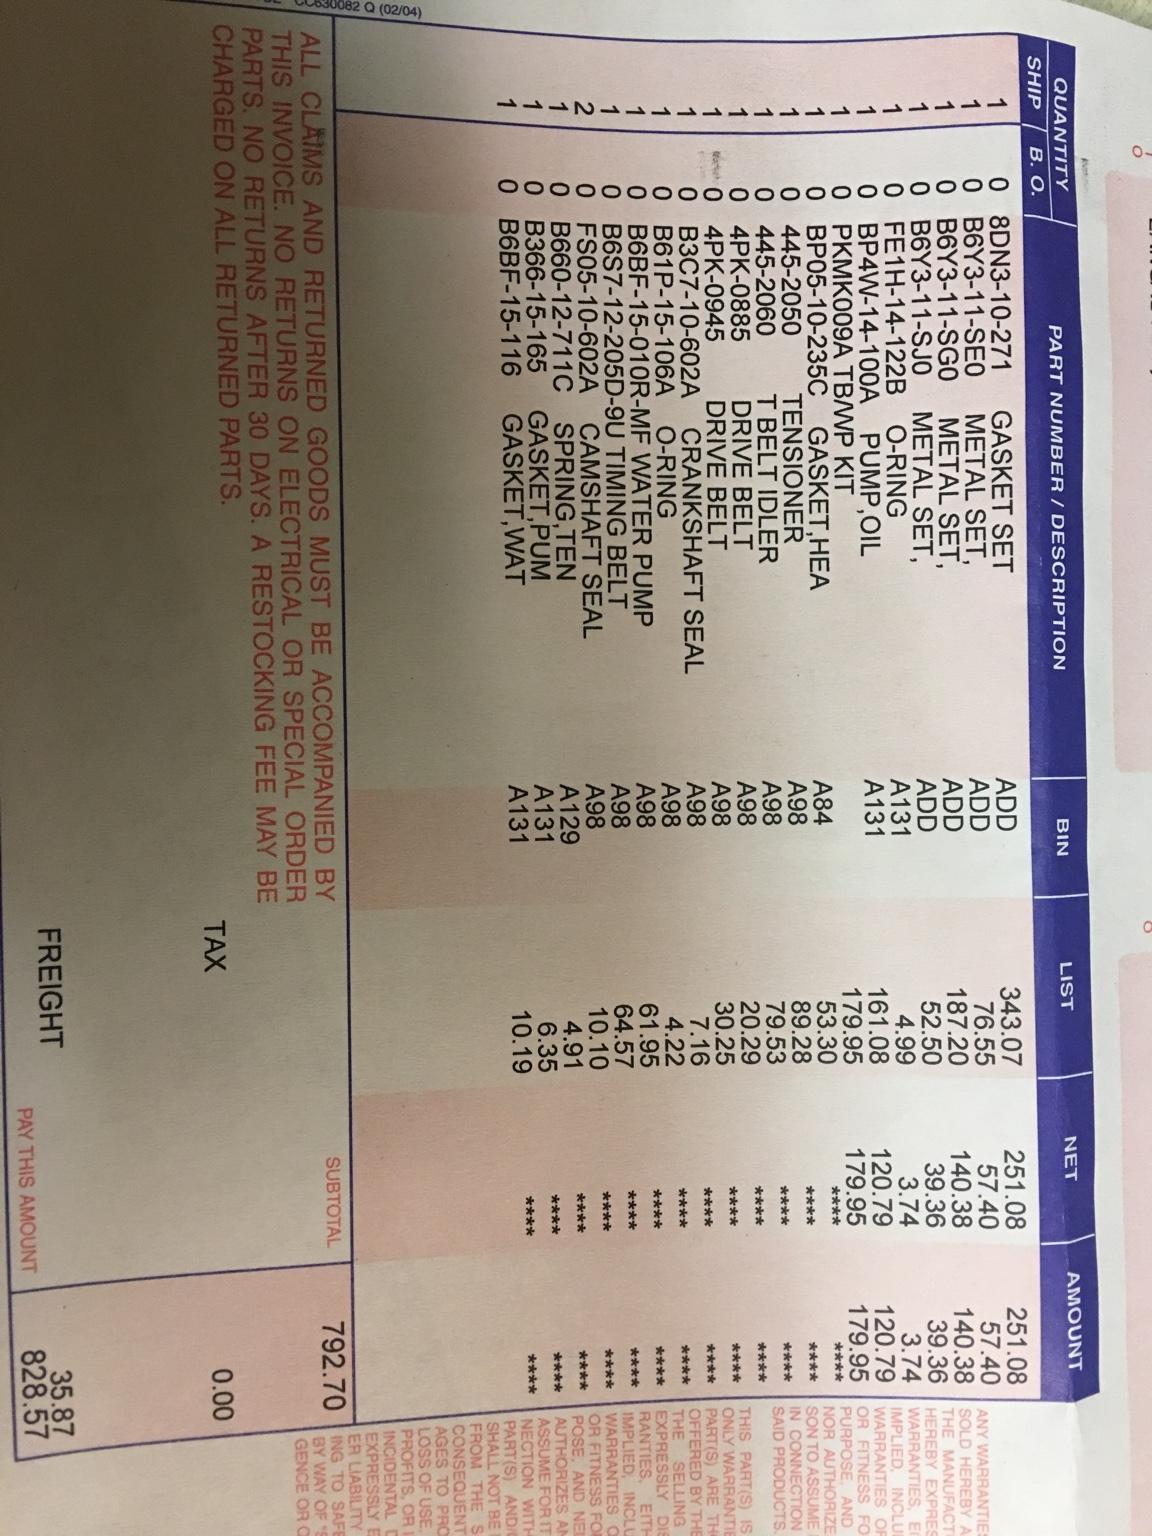 $495 to replace timing belt? - MX-5 Miata Forum